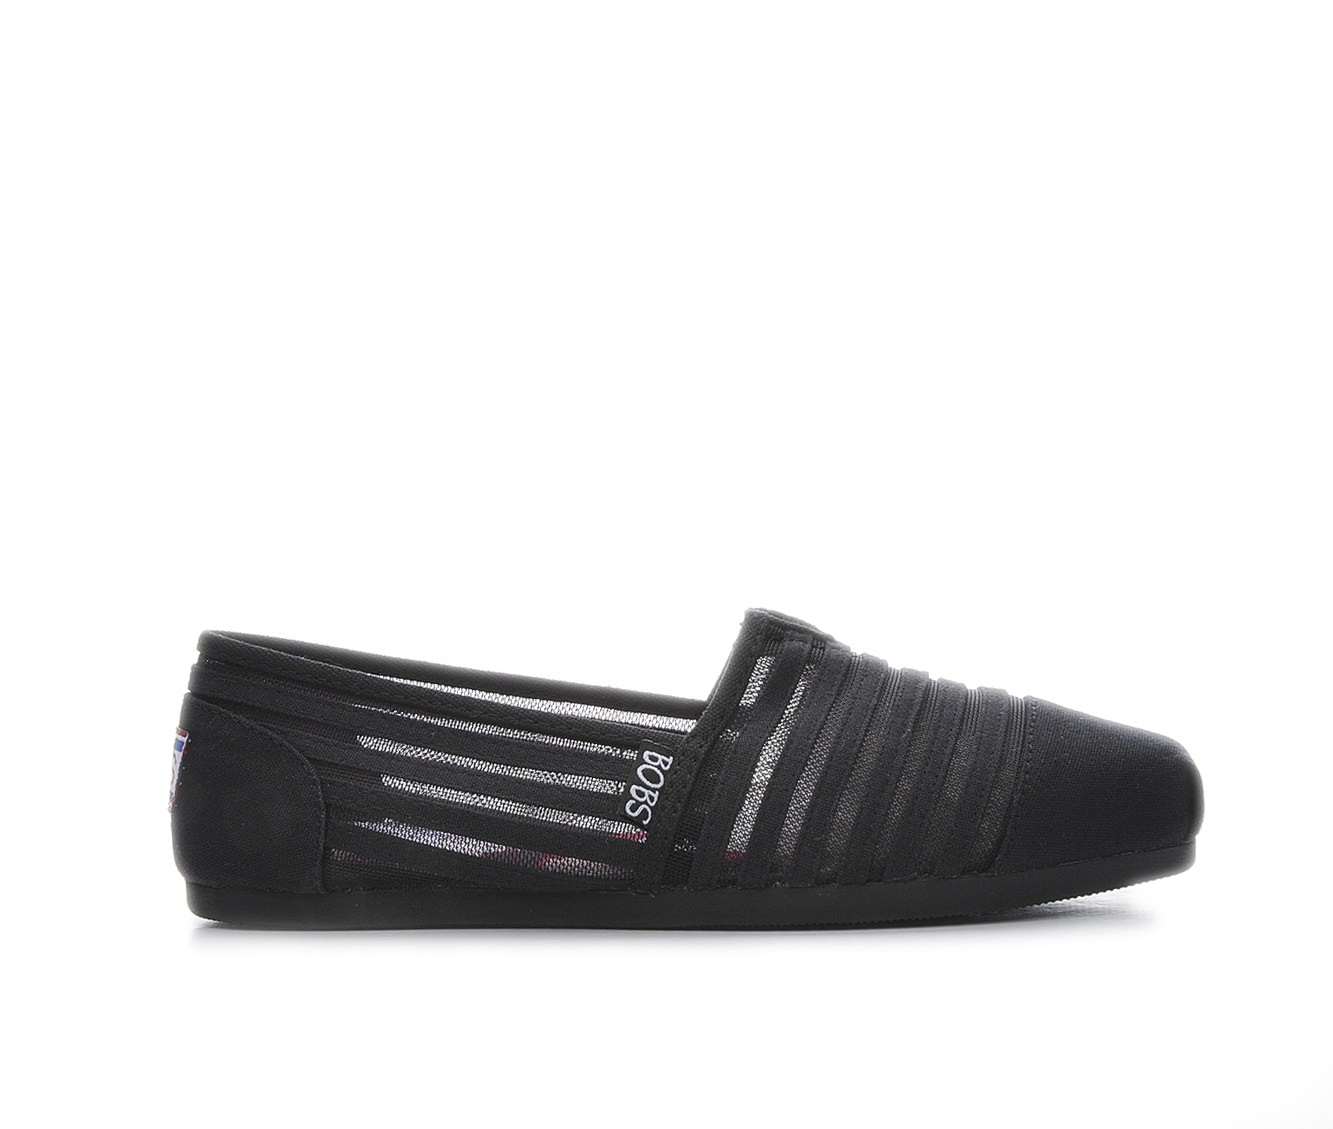 BOBS Adorbs 34245 Women's Shoe (Black Canvas)